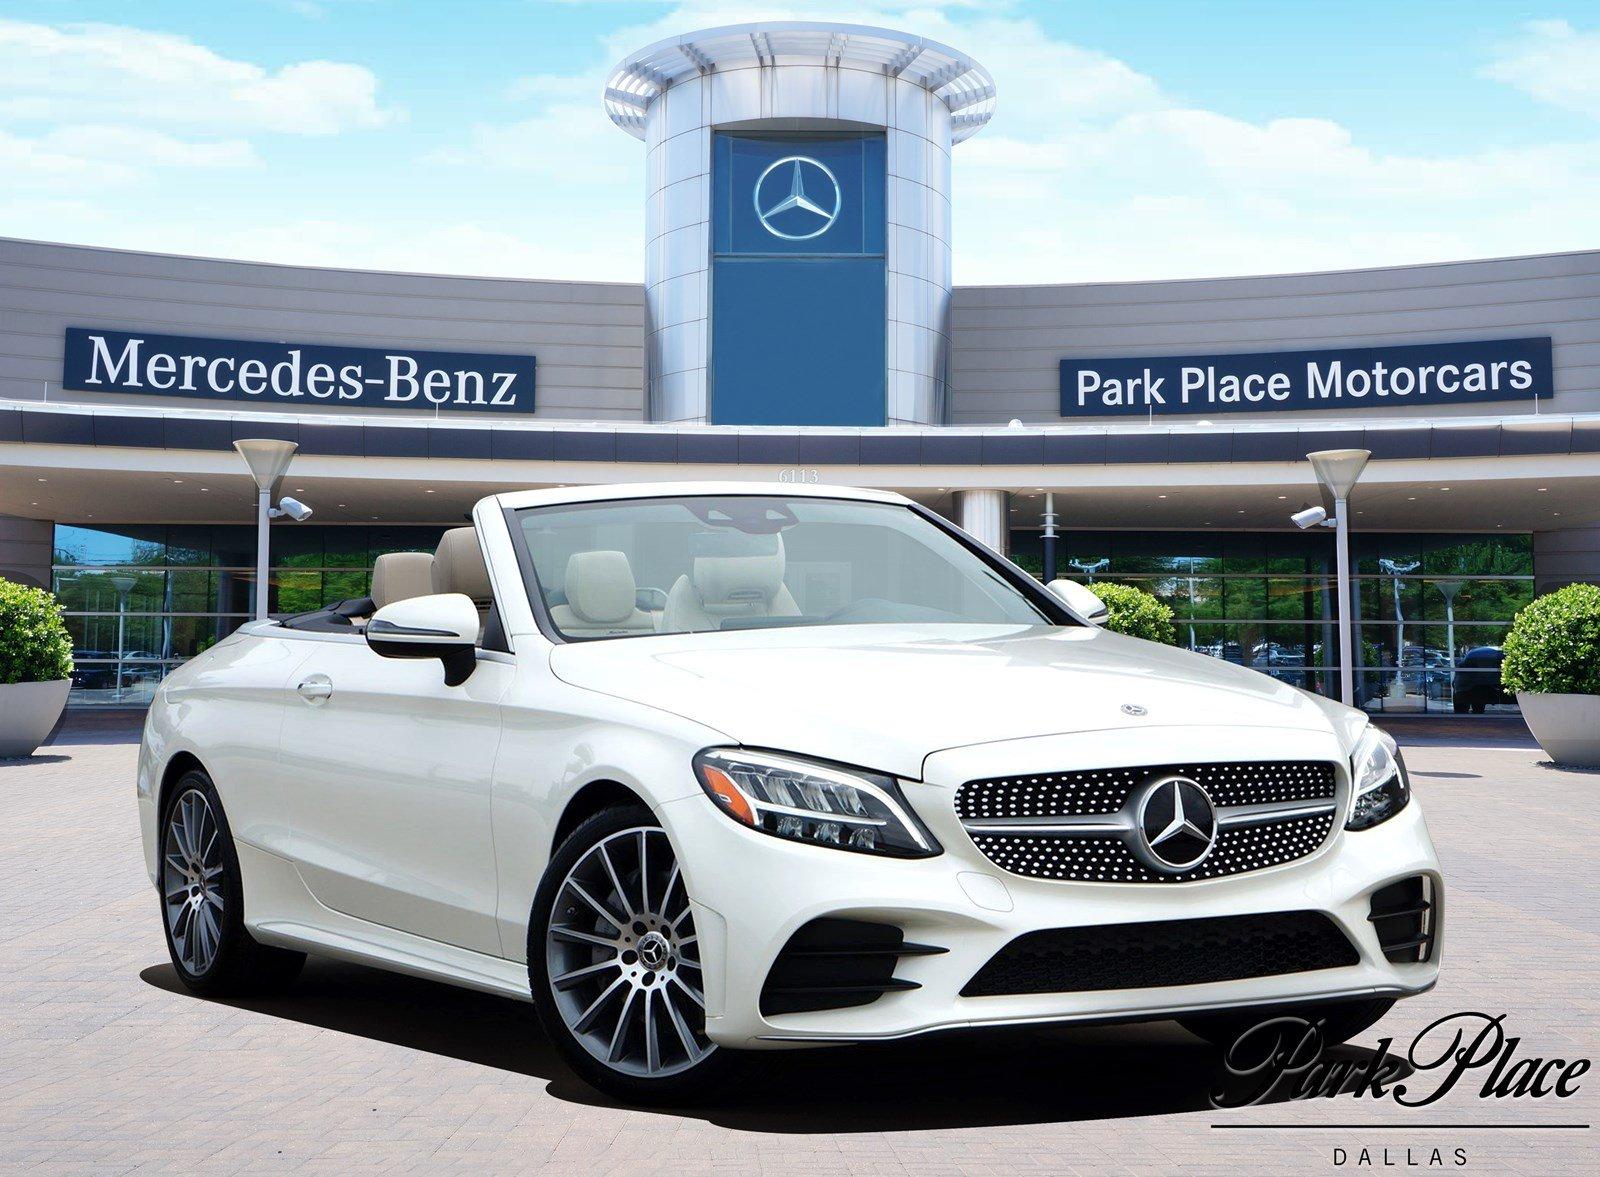 Mercedes Benz Dallas >> New 2019 Mercedes Benz C Class For Sale At Park Place Motorcars Dallas Vin Wddwk8db0kf775936